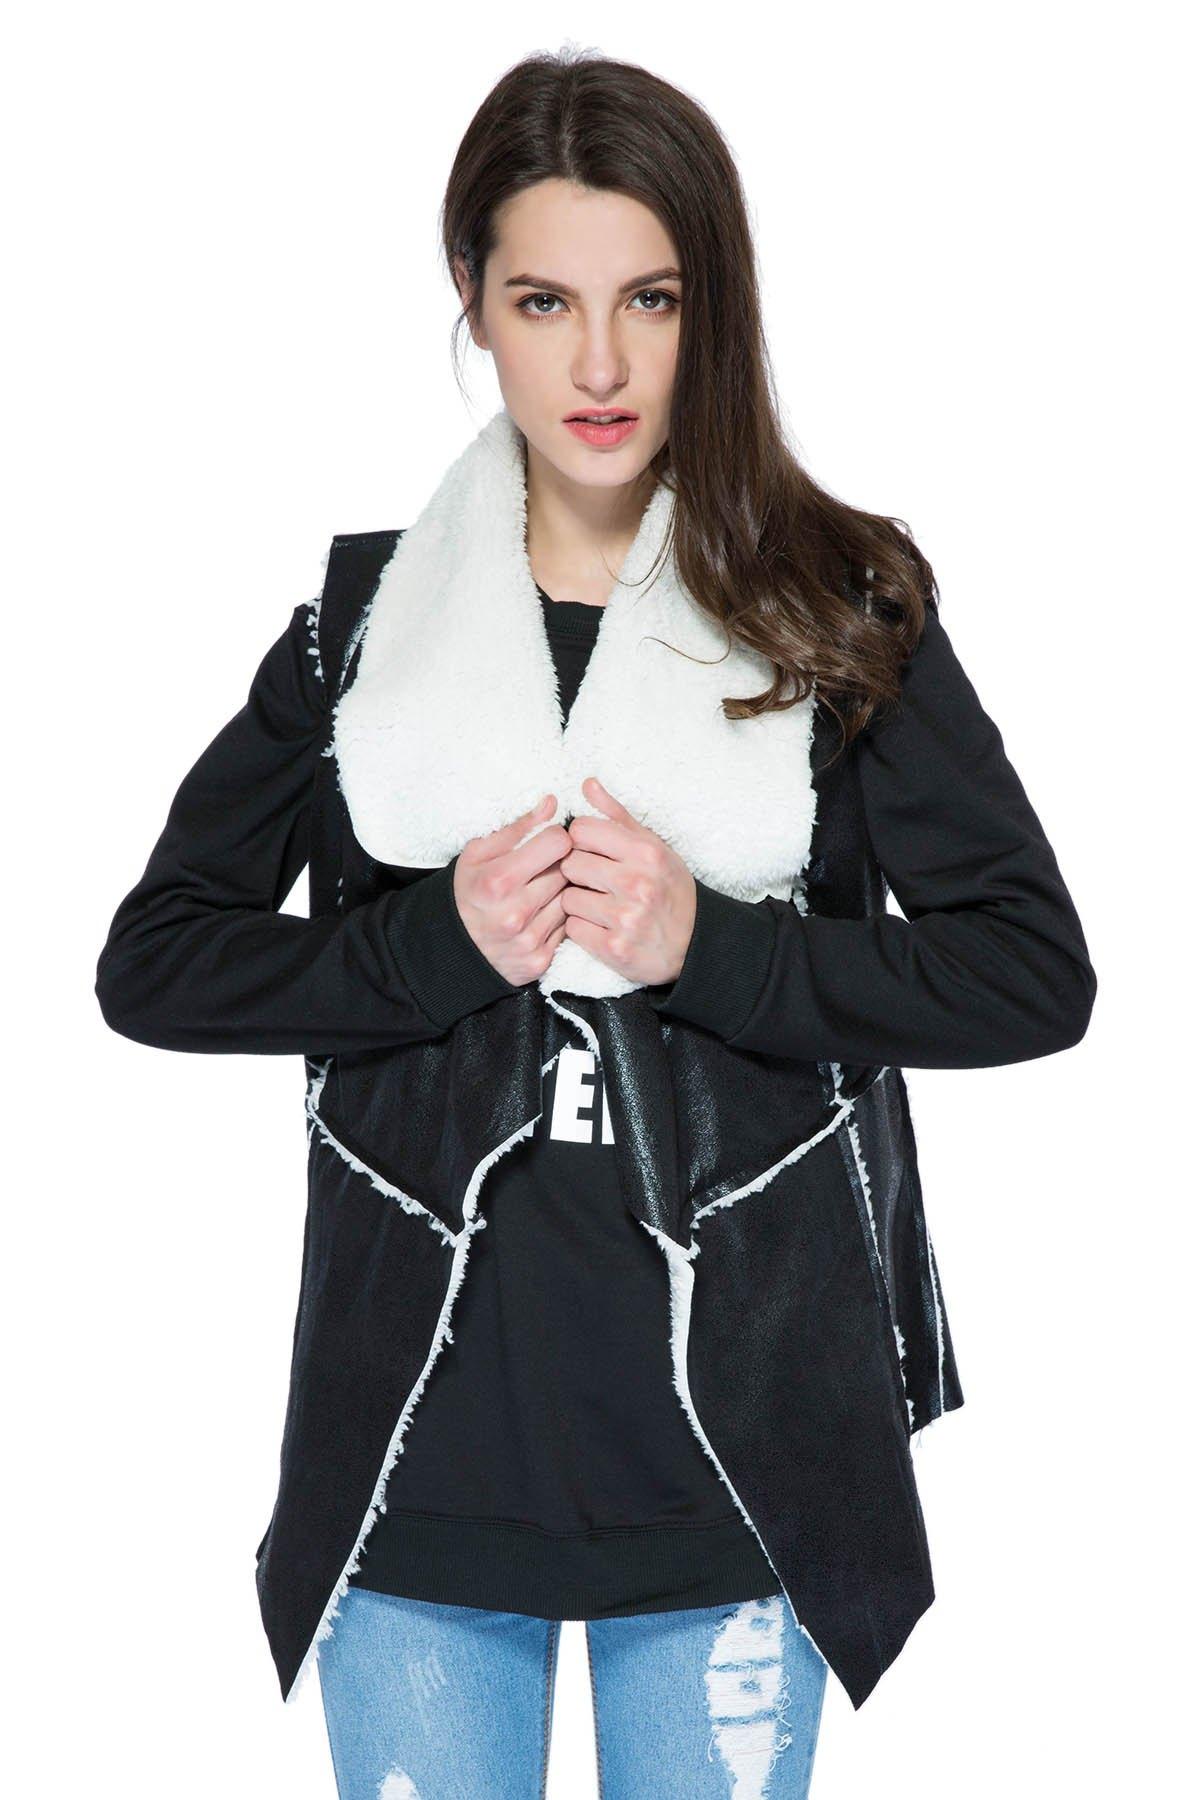 Turn-Down Collar Sleeveless Lamb Wool and PU Leather Splicing Waistcoat